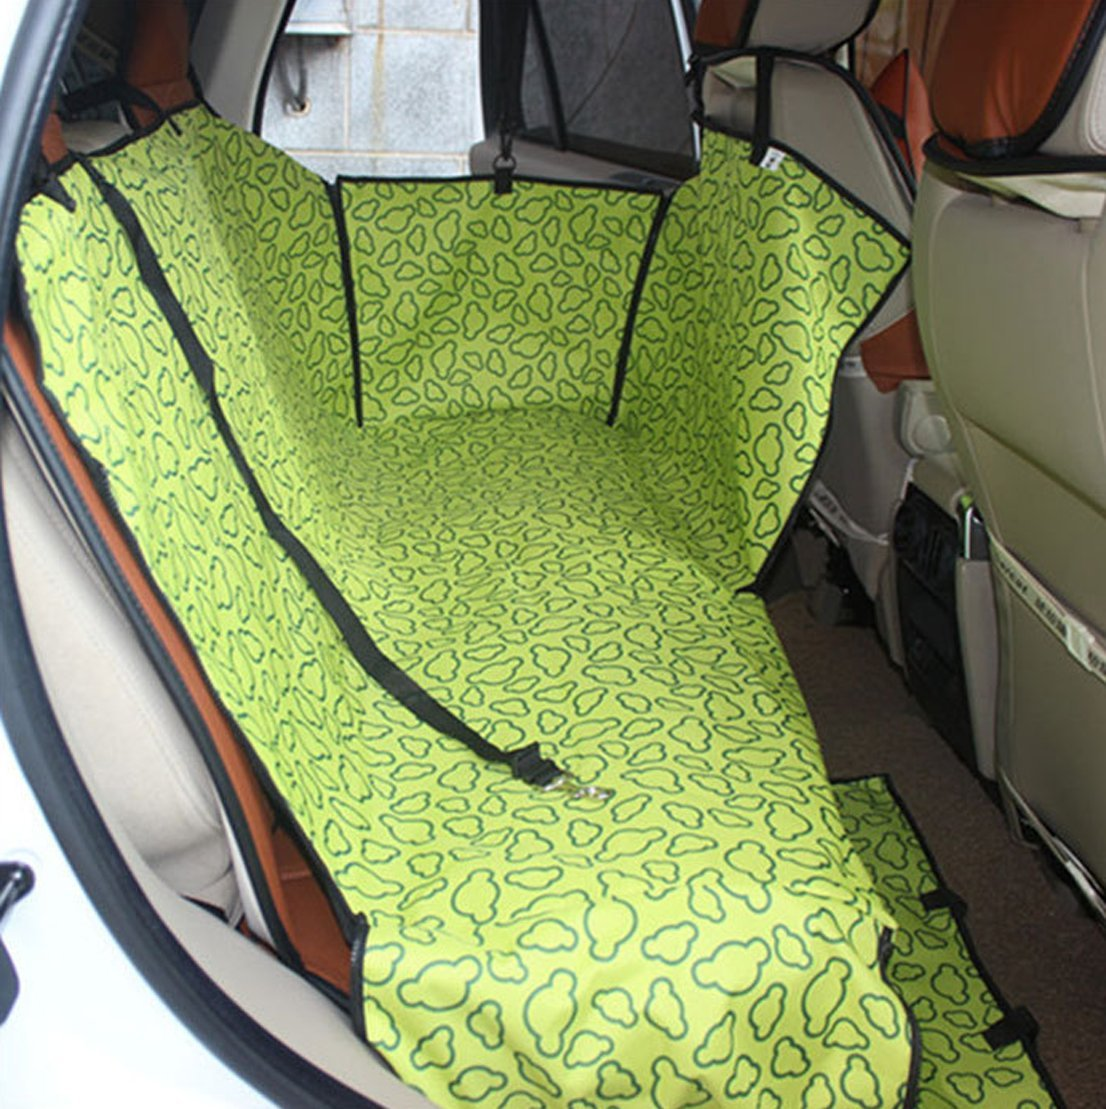 Yiyida Hunde Autositz Doppelsitz F/ür R/ückbank Wasserdicht Hund Sitzbezug F/ür Haustier Abriebfest Hund Sitzbezug Autoschutzdecke Auto Hundedecke Autoschondecke 130x150x55cm